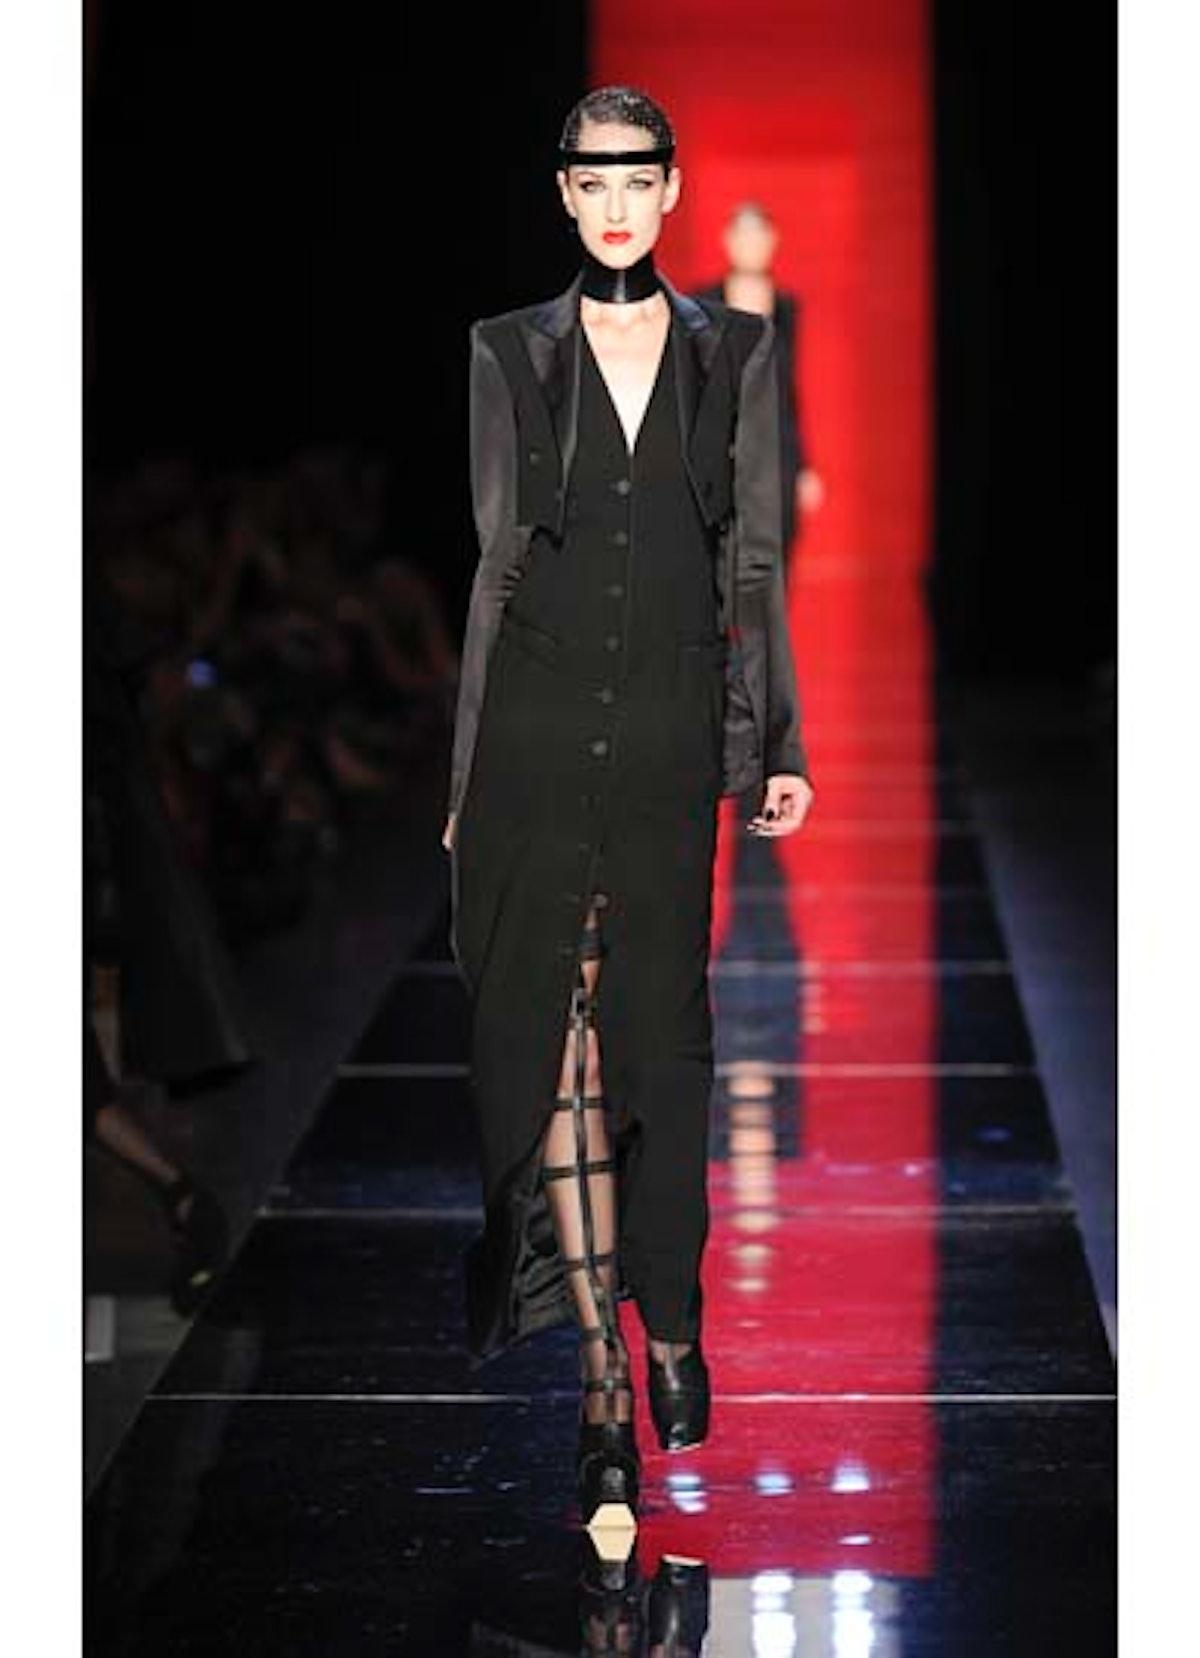 fass-jean-paul-gaultier-couture-2012-runway-07-v.jpg